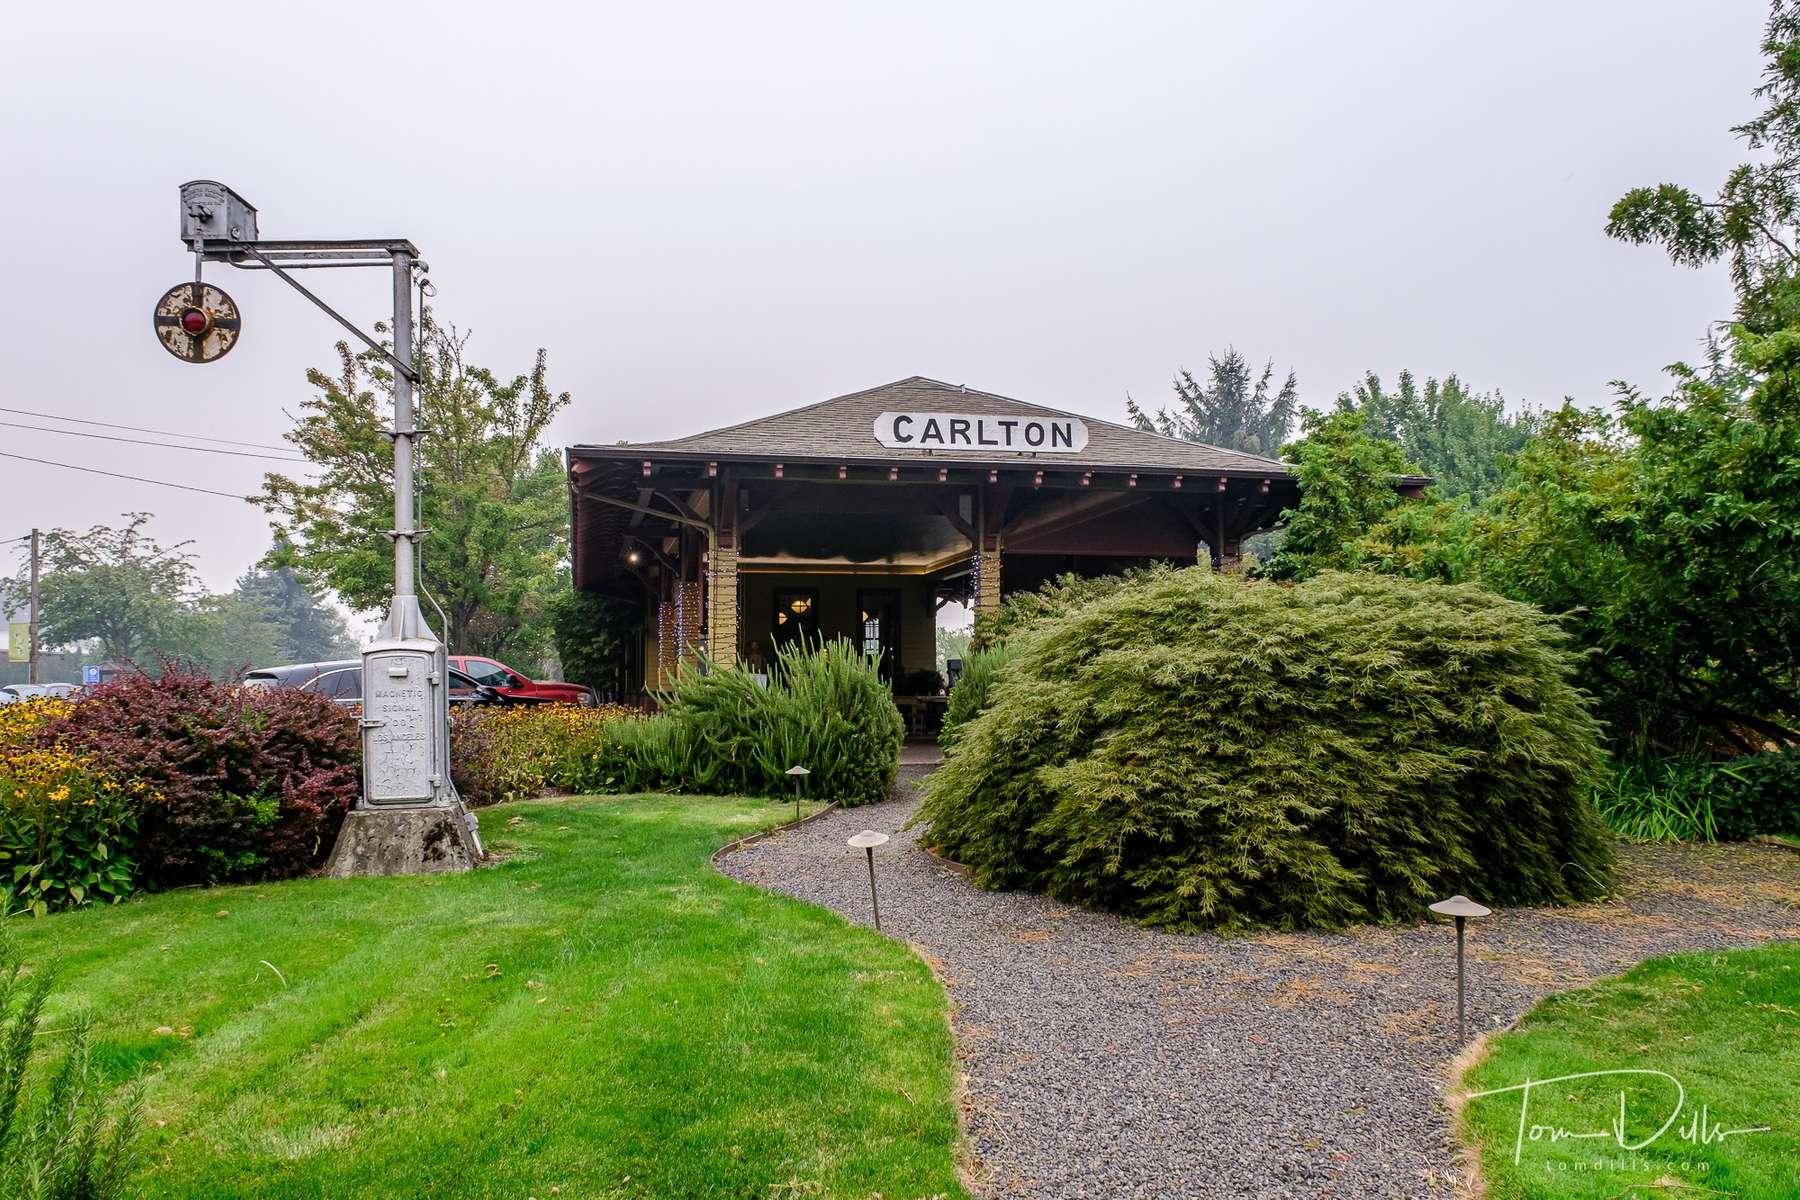 Ken Wright Cellars Winery tasting room in a restored train depot in Carlton, Oregon